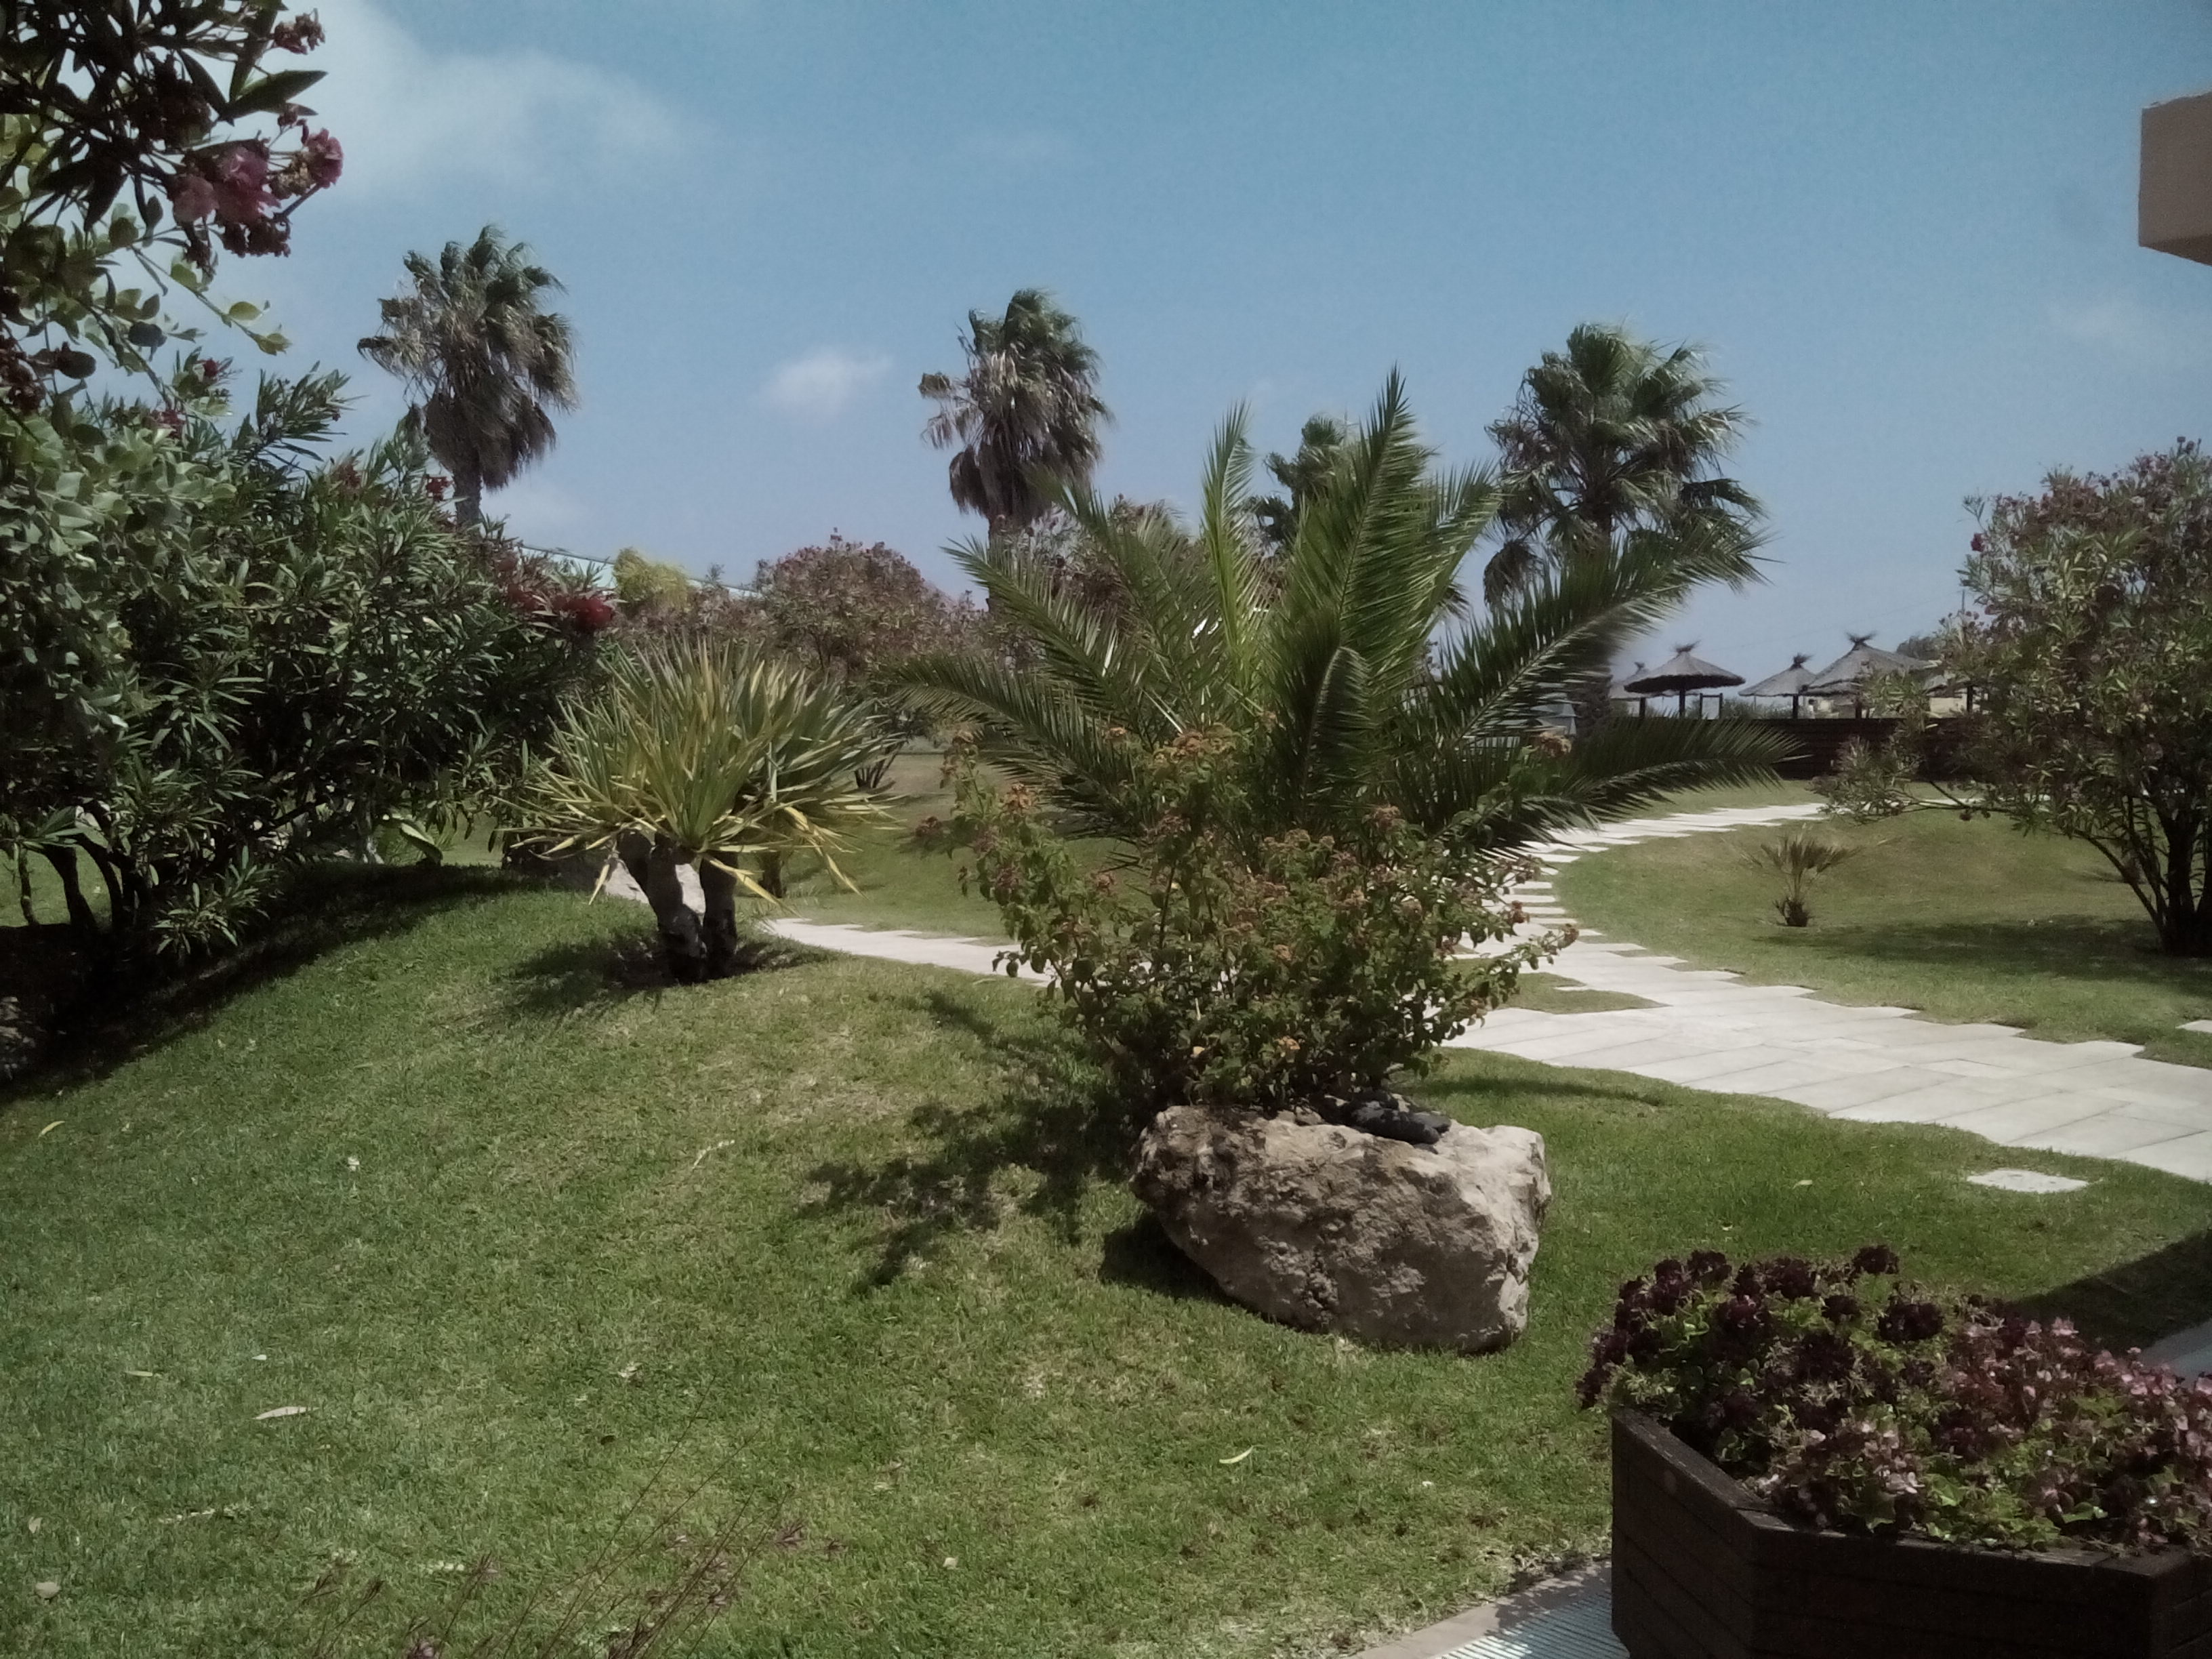 sentiero spiaggiahotel